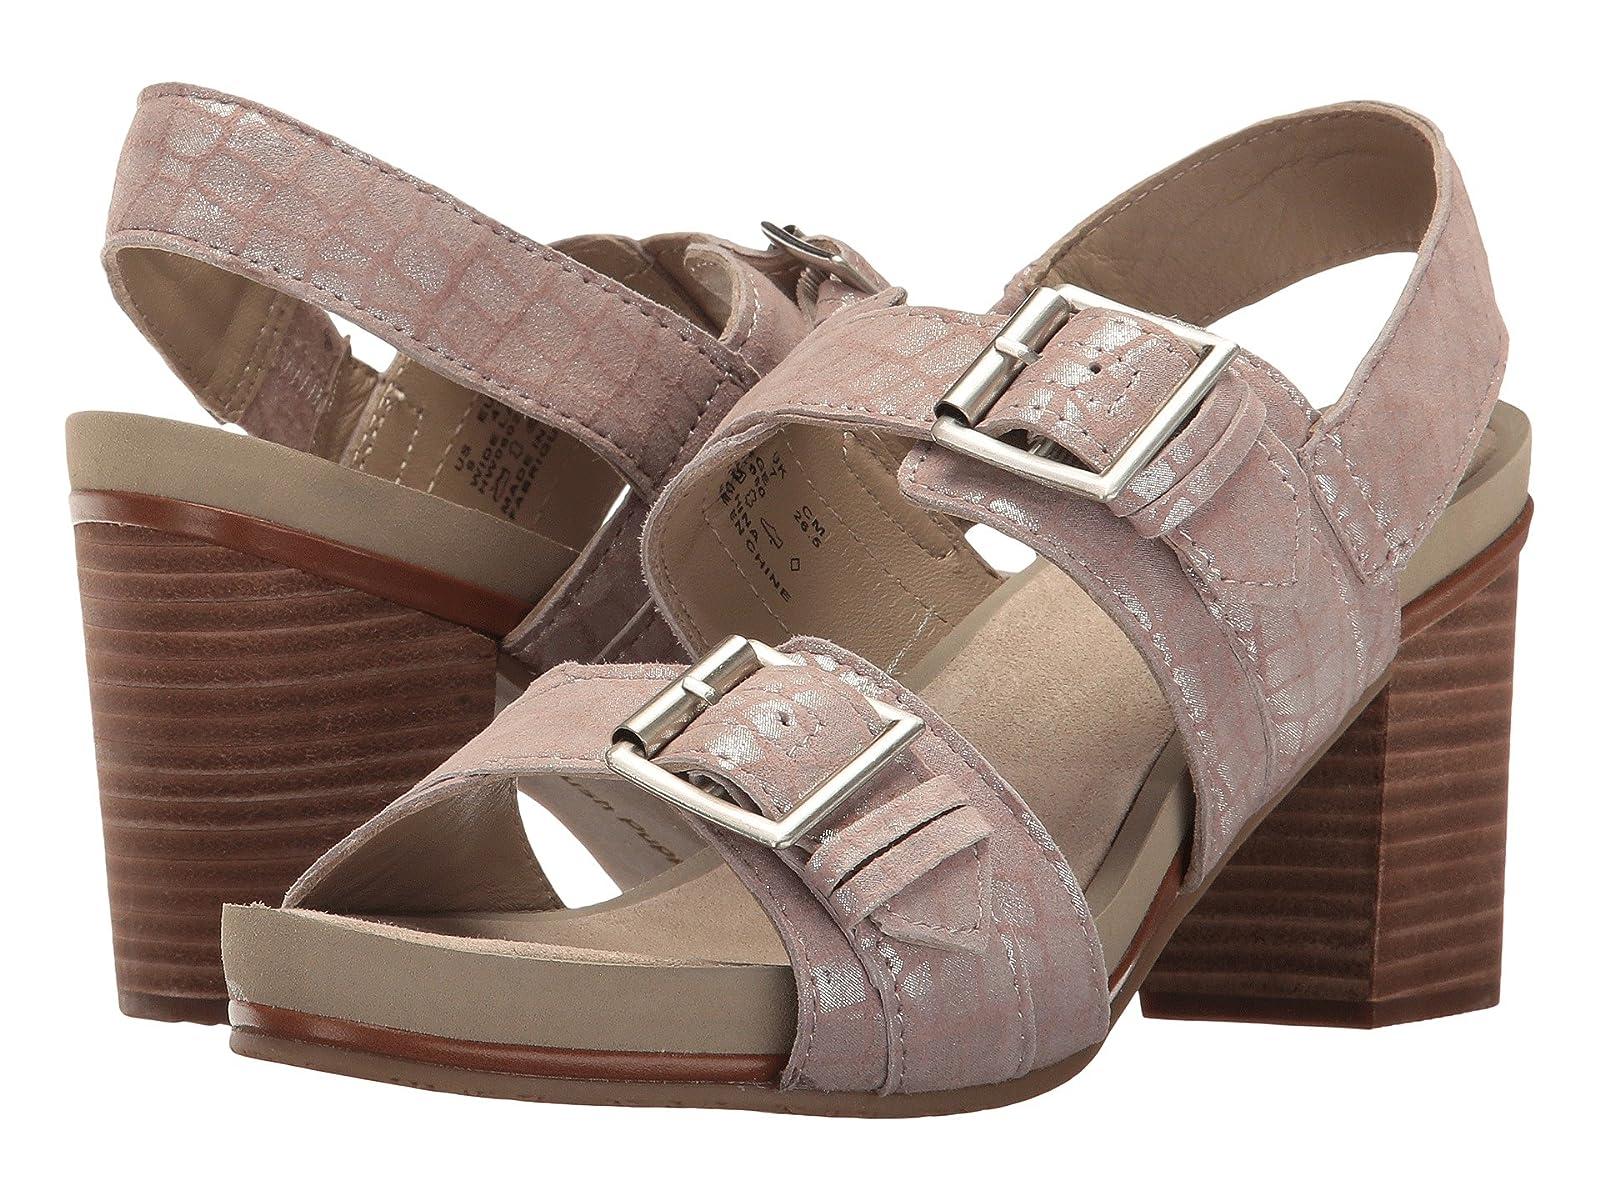 Hush Puppies Leonie MariskaCheap and distinctive eye-catching shoes